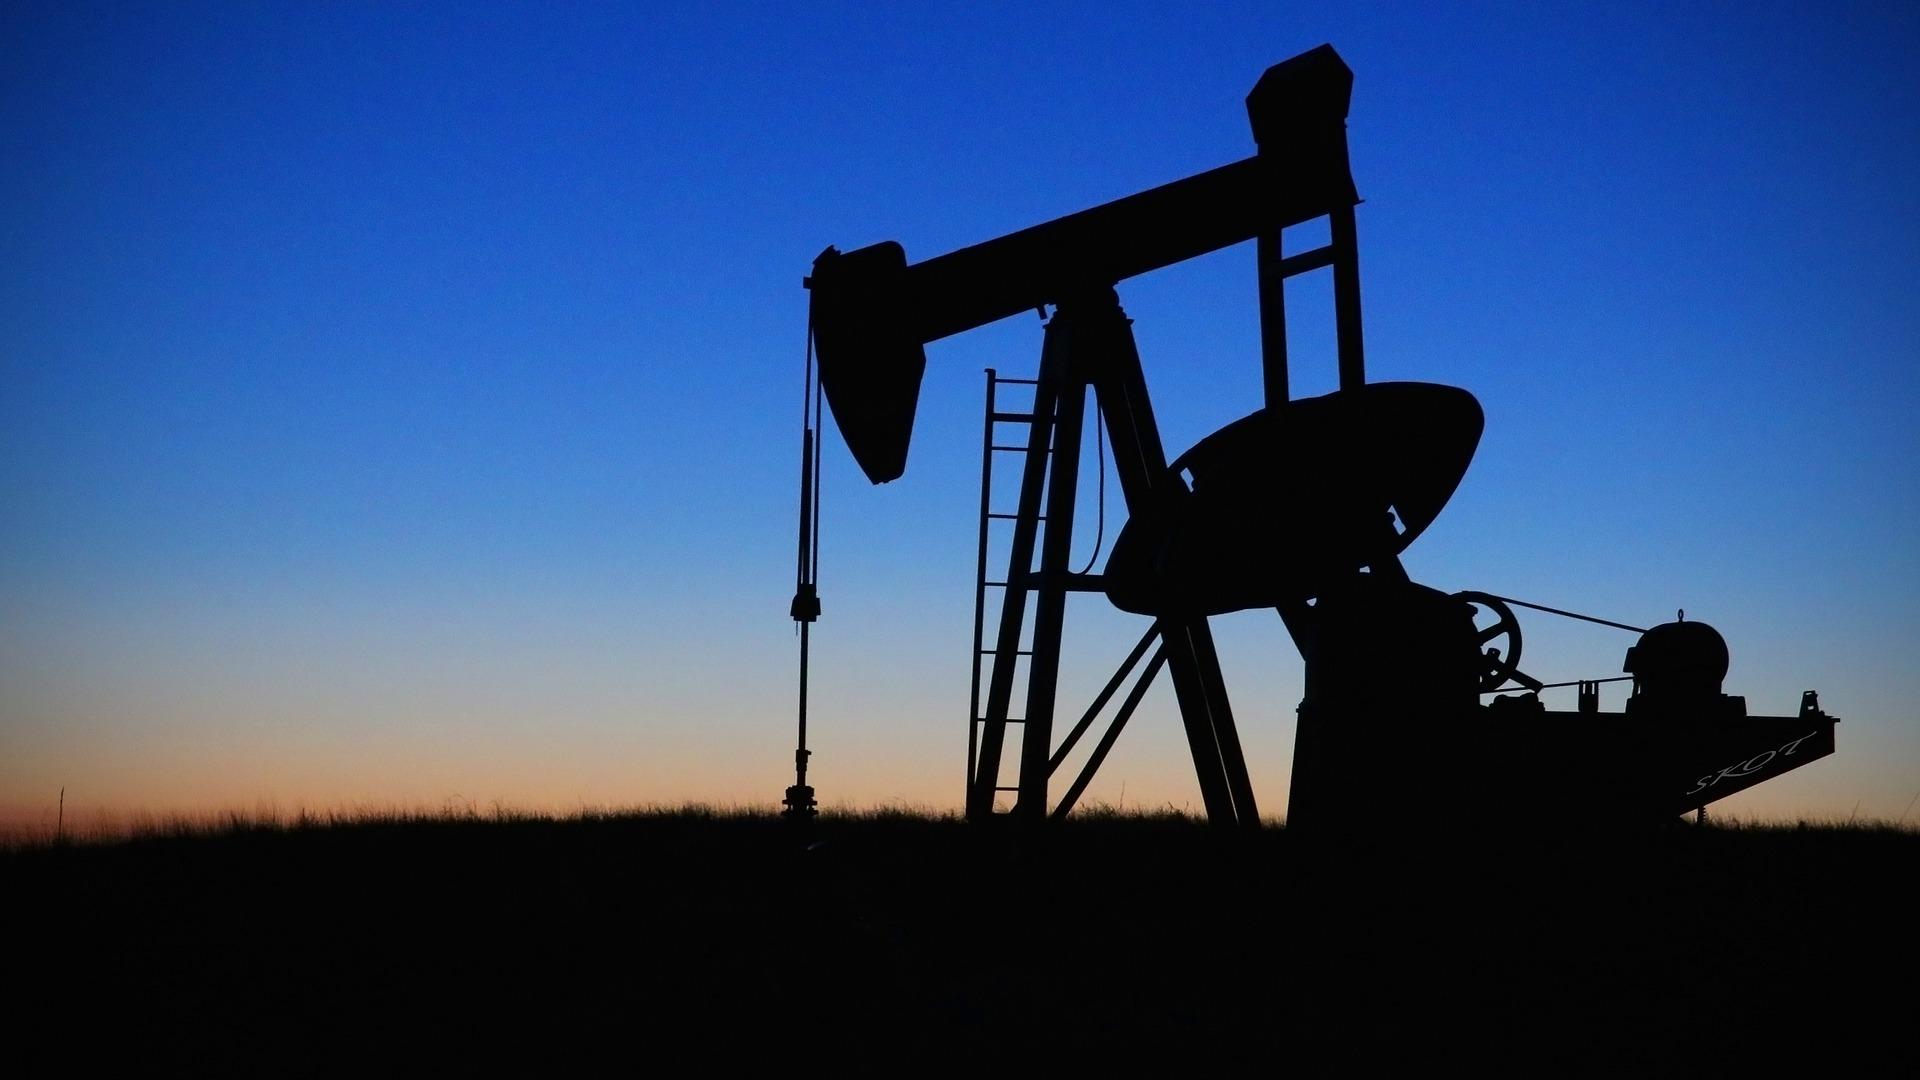 Agip shuts down Idu Well 11 in Nigeria after oil leak